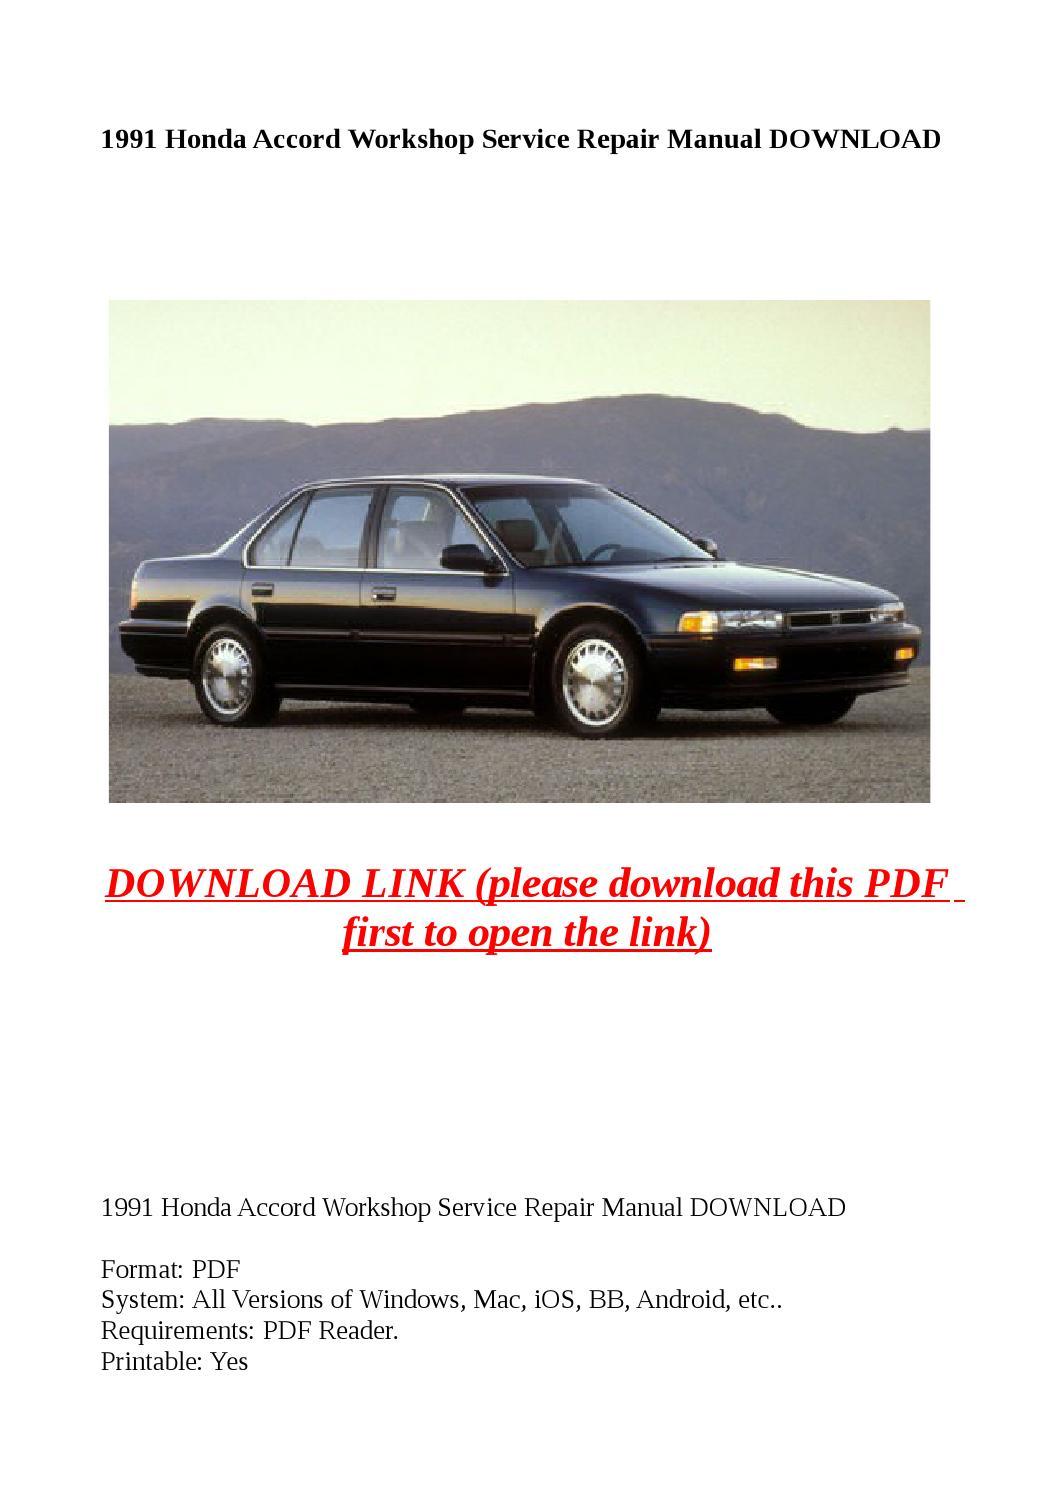 1991 Honda Civic Battery Wiring Diagram Electrical Problem 1991